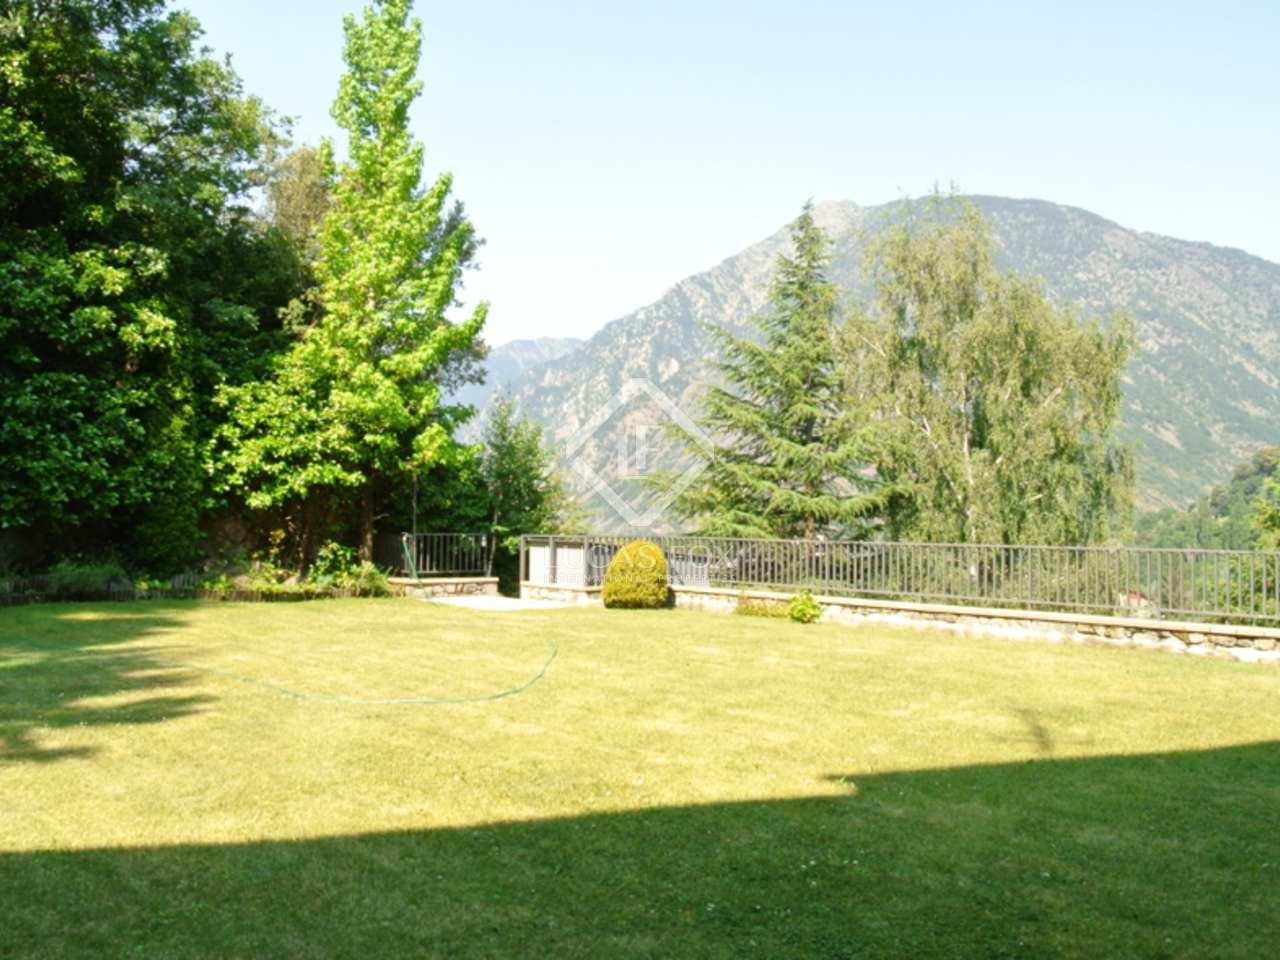 Maison villa de 1 700m a vendre andorra la vella avec for Jardin anglais caracteristiques